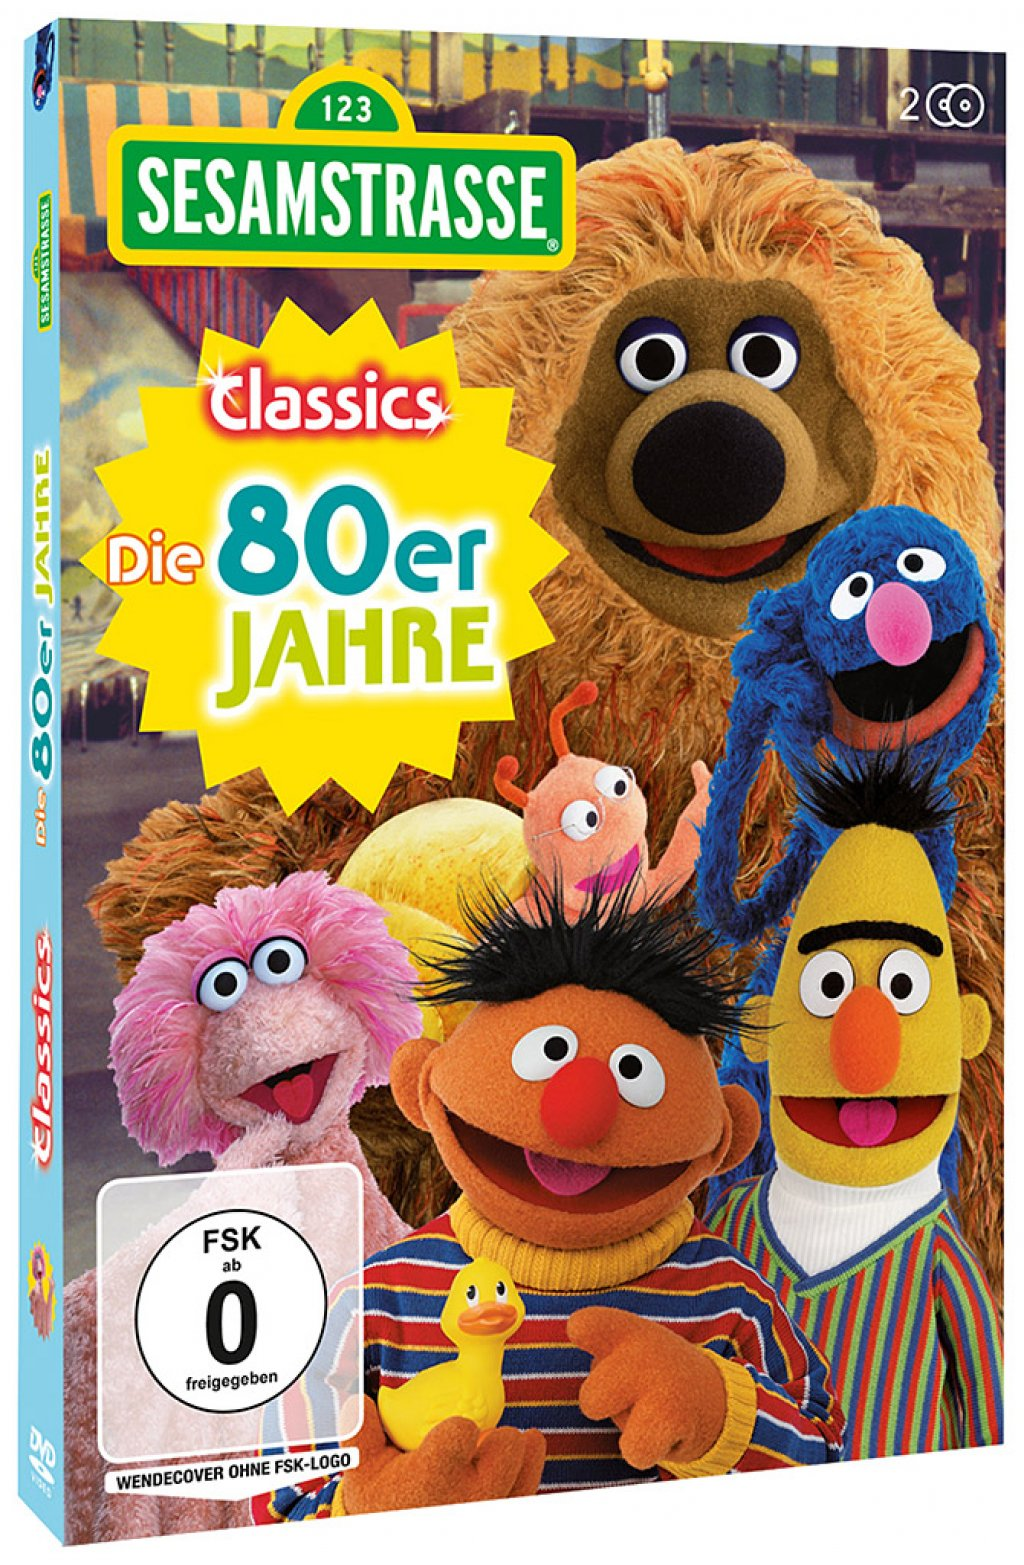 a51814ca12 Sesamstrasse Classics - Die 80er Jahre # 2-DVD-NEU | eBay